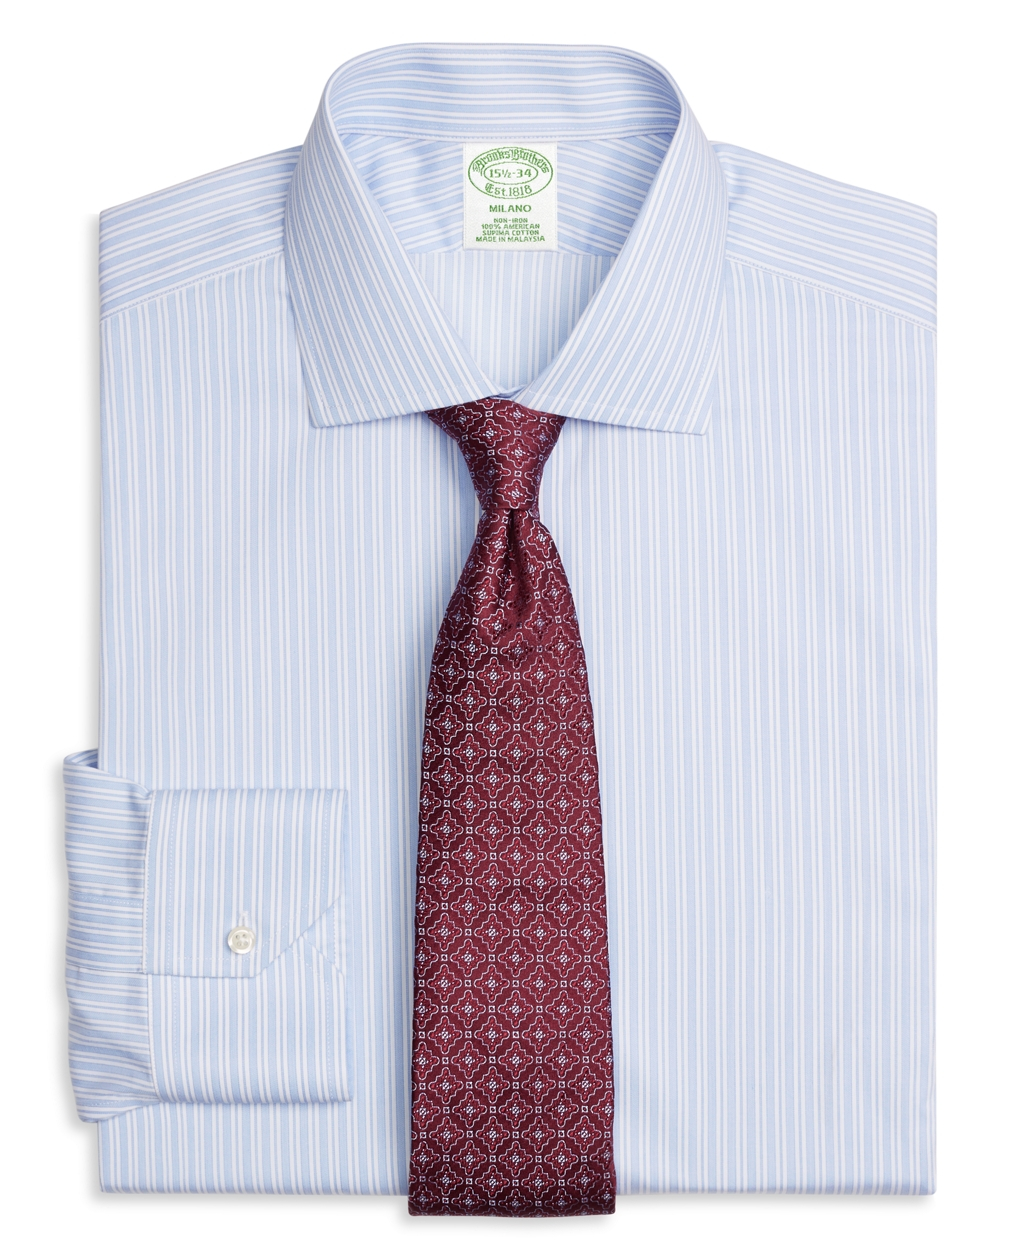 Brooks brothers non iron milano fit stripe dress shirt in for Brooks brothers dress shirt fit